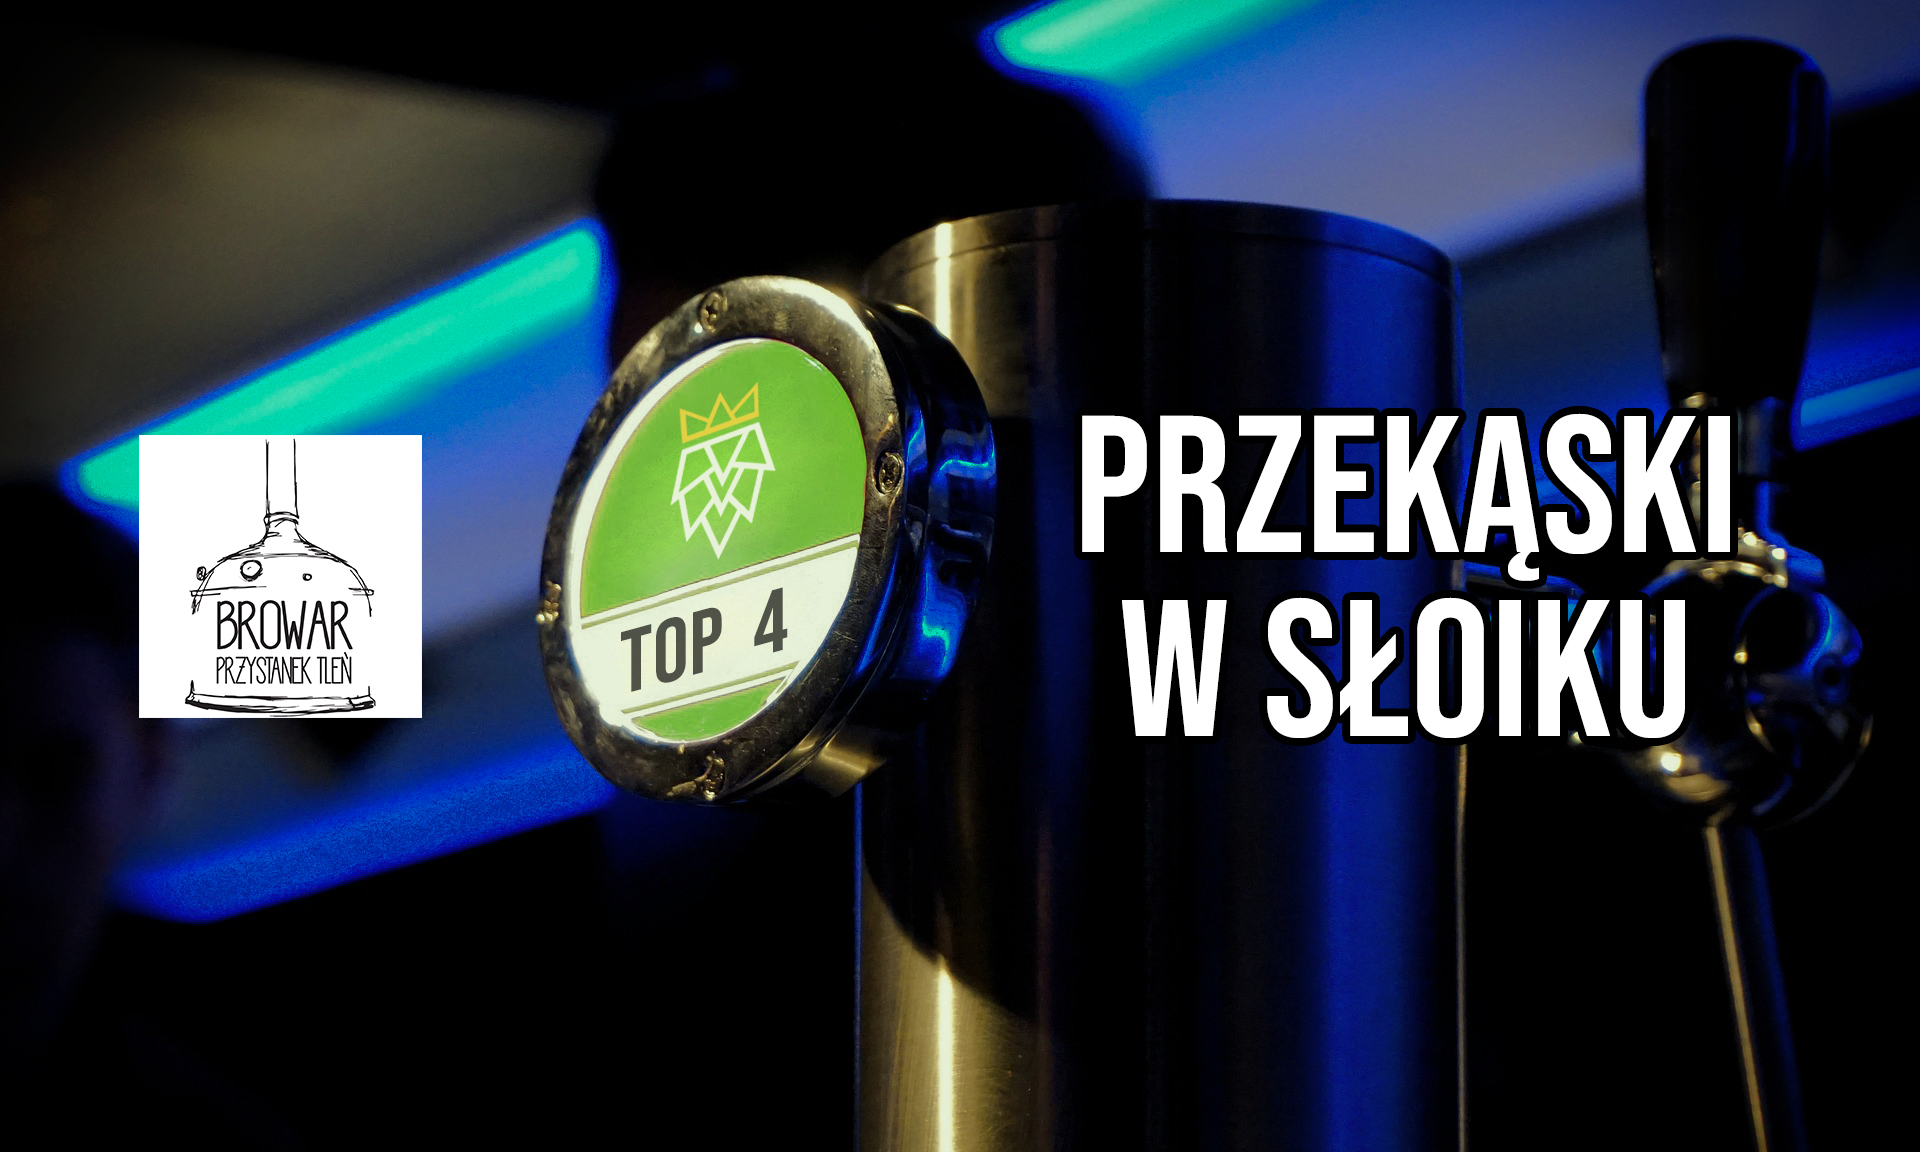 TOP4 Przekąsek